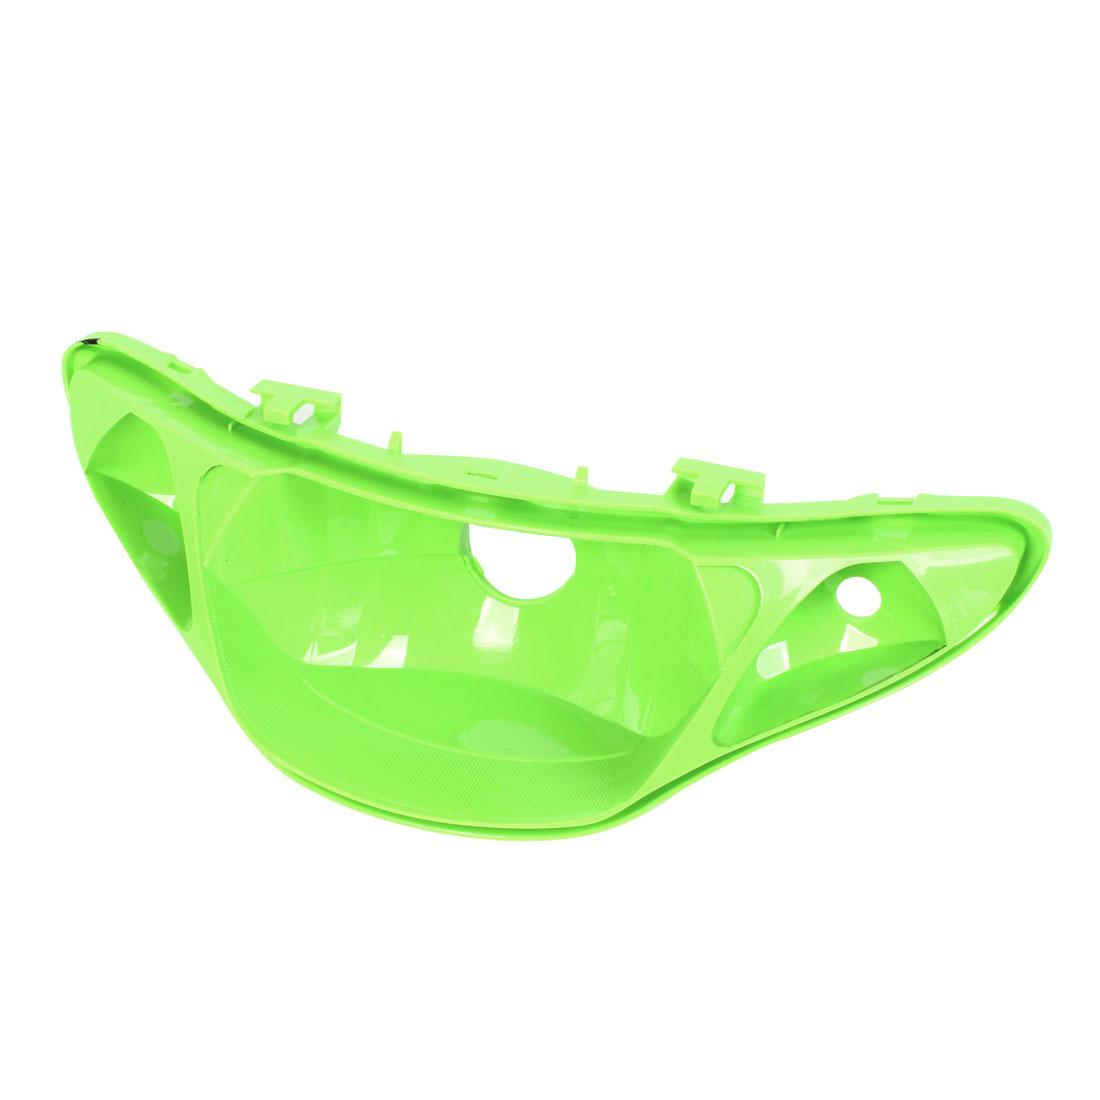 Green Plastic Rear Tail Fog Brake Light Lamp Cover Trim for Motorcycle